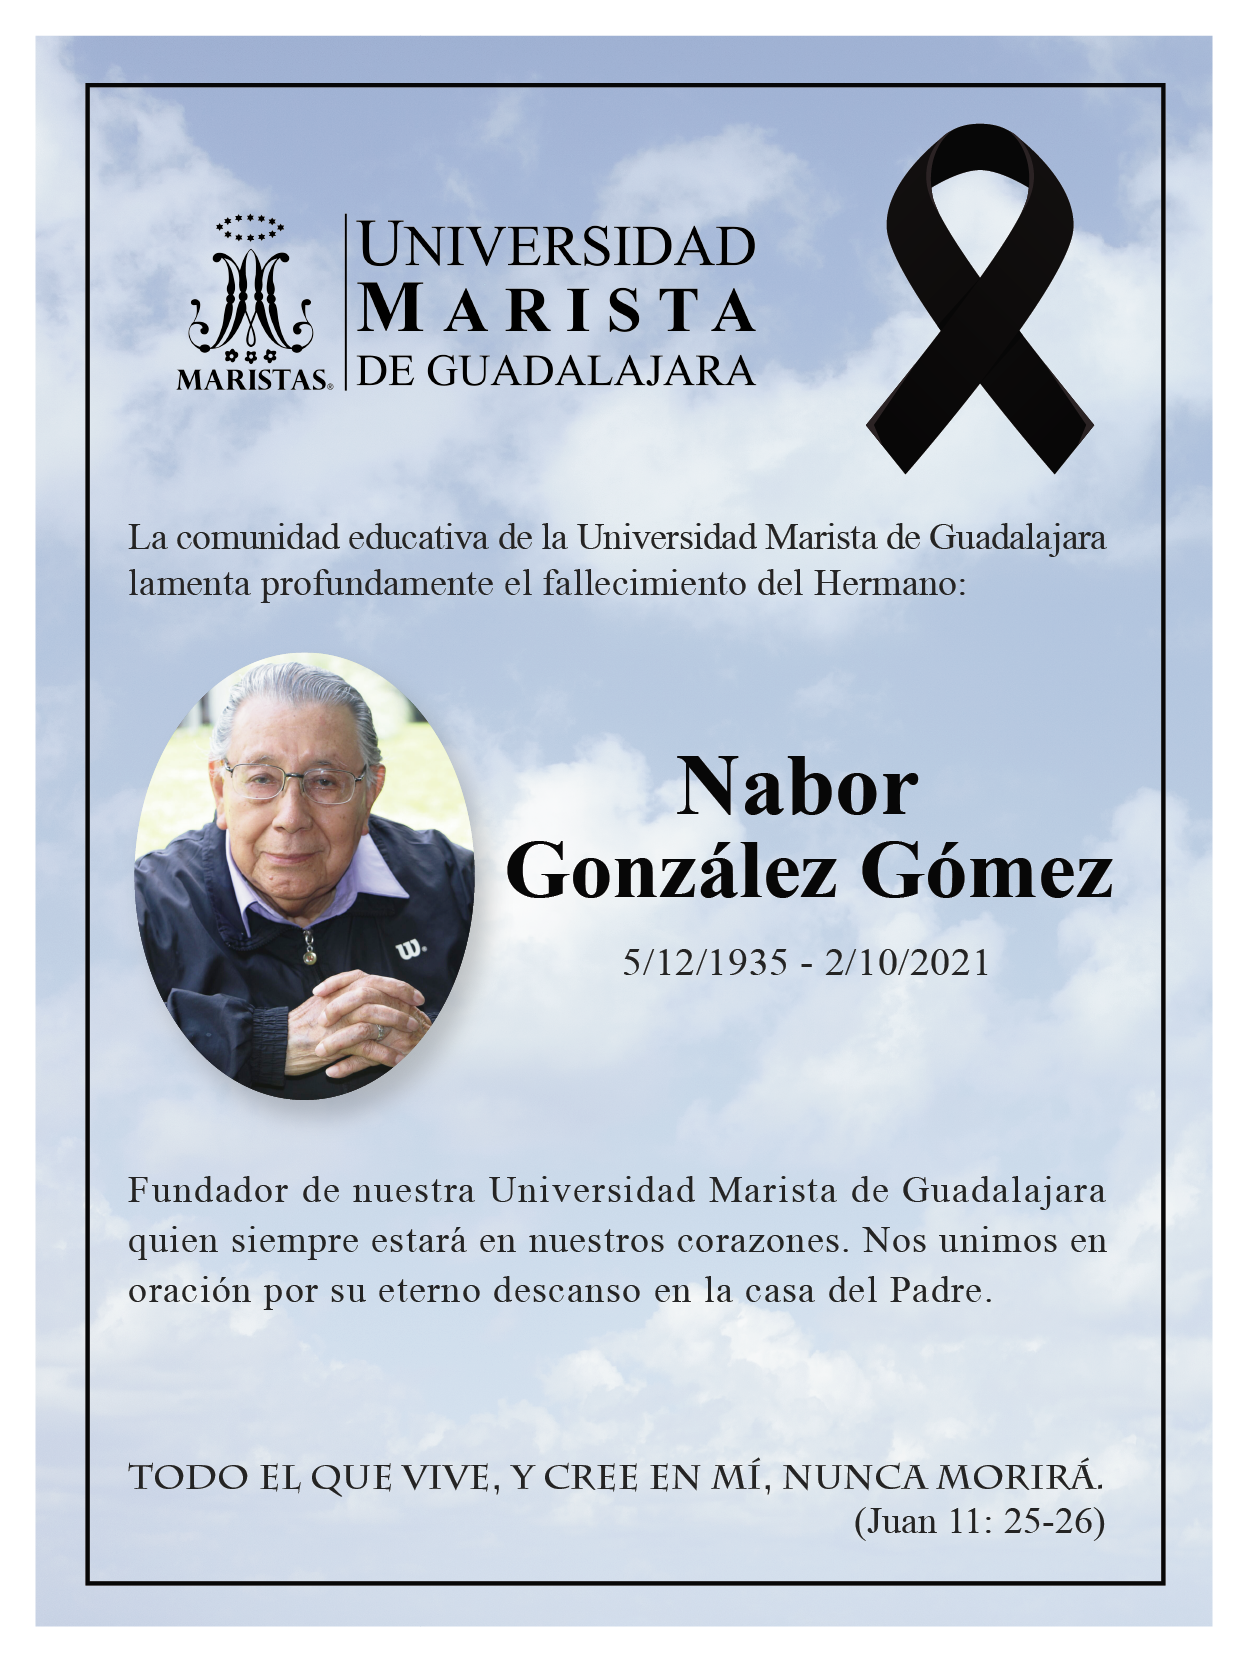 Fallecimiento del H. Nabor González Gómez